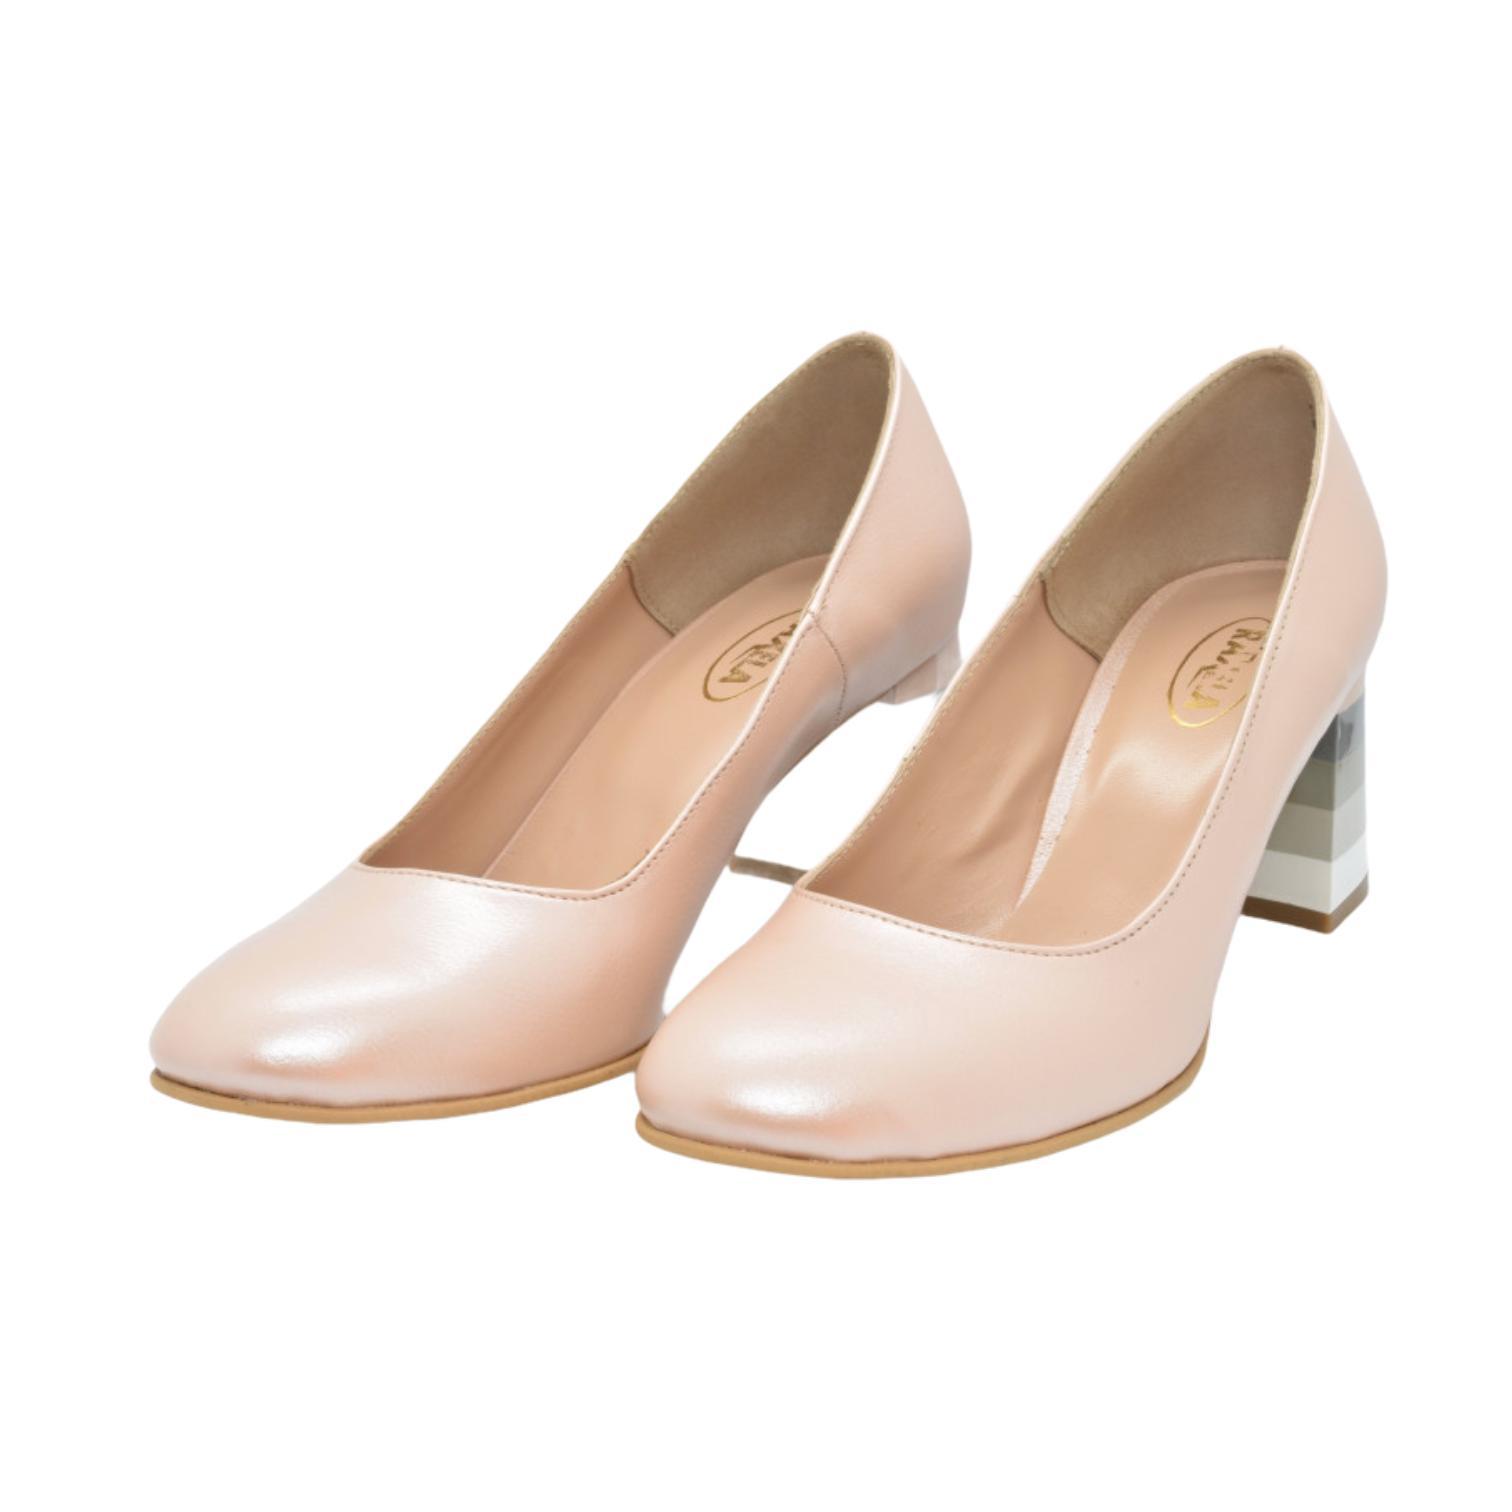 Pantofi pudra cu toc colorat in dungi